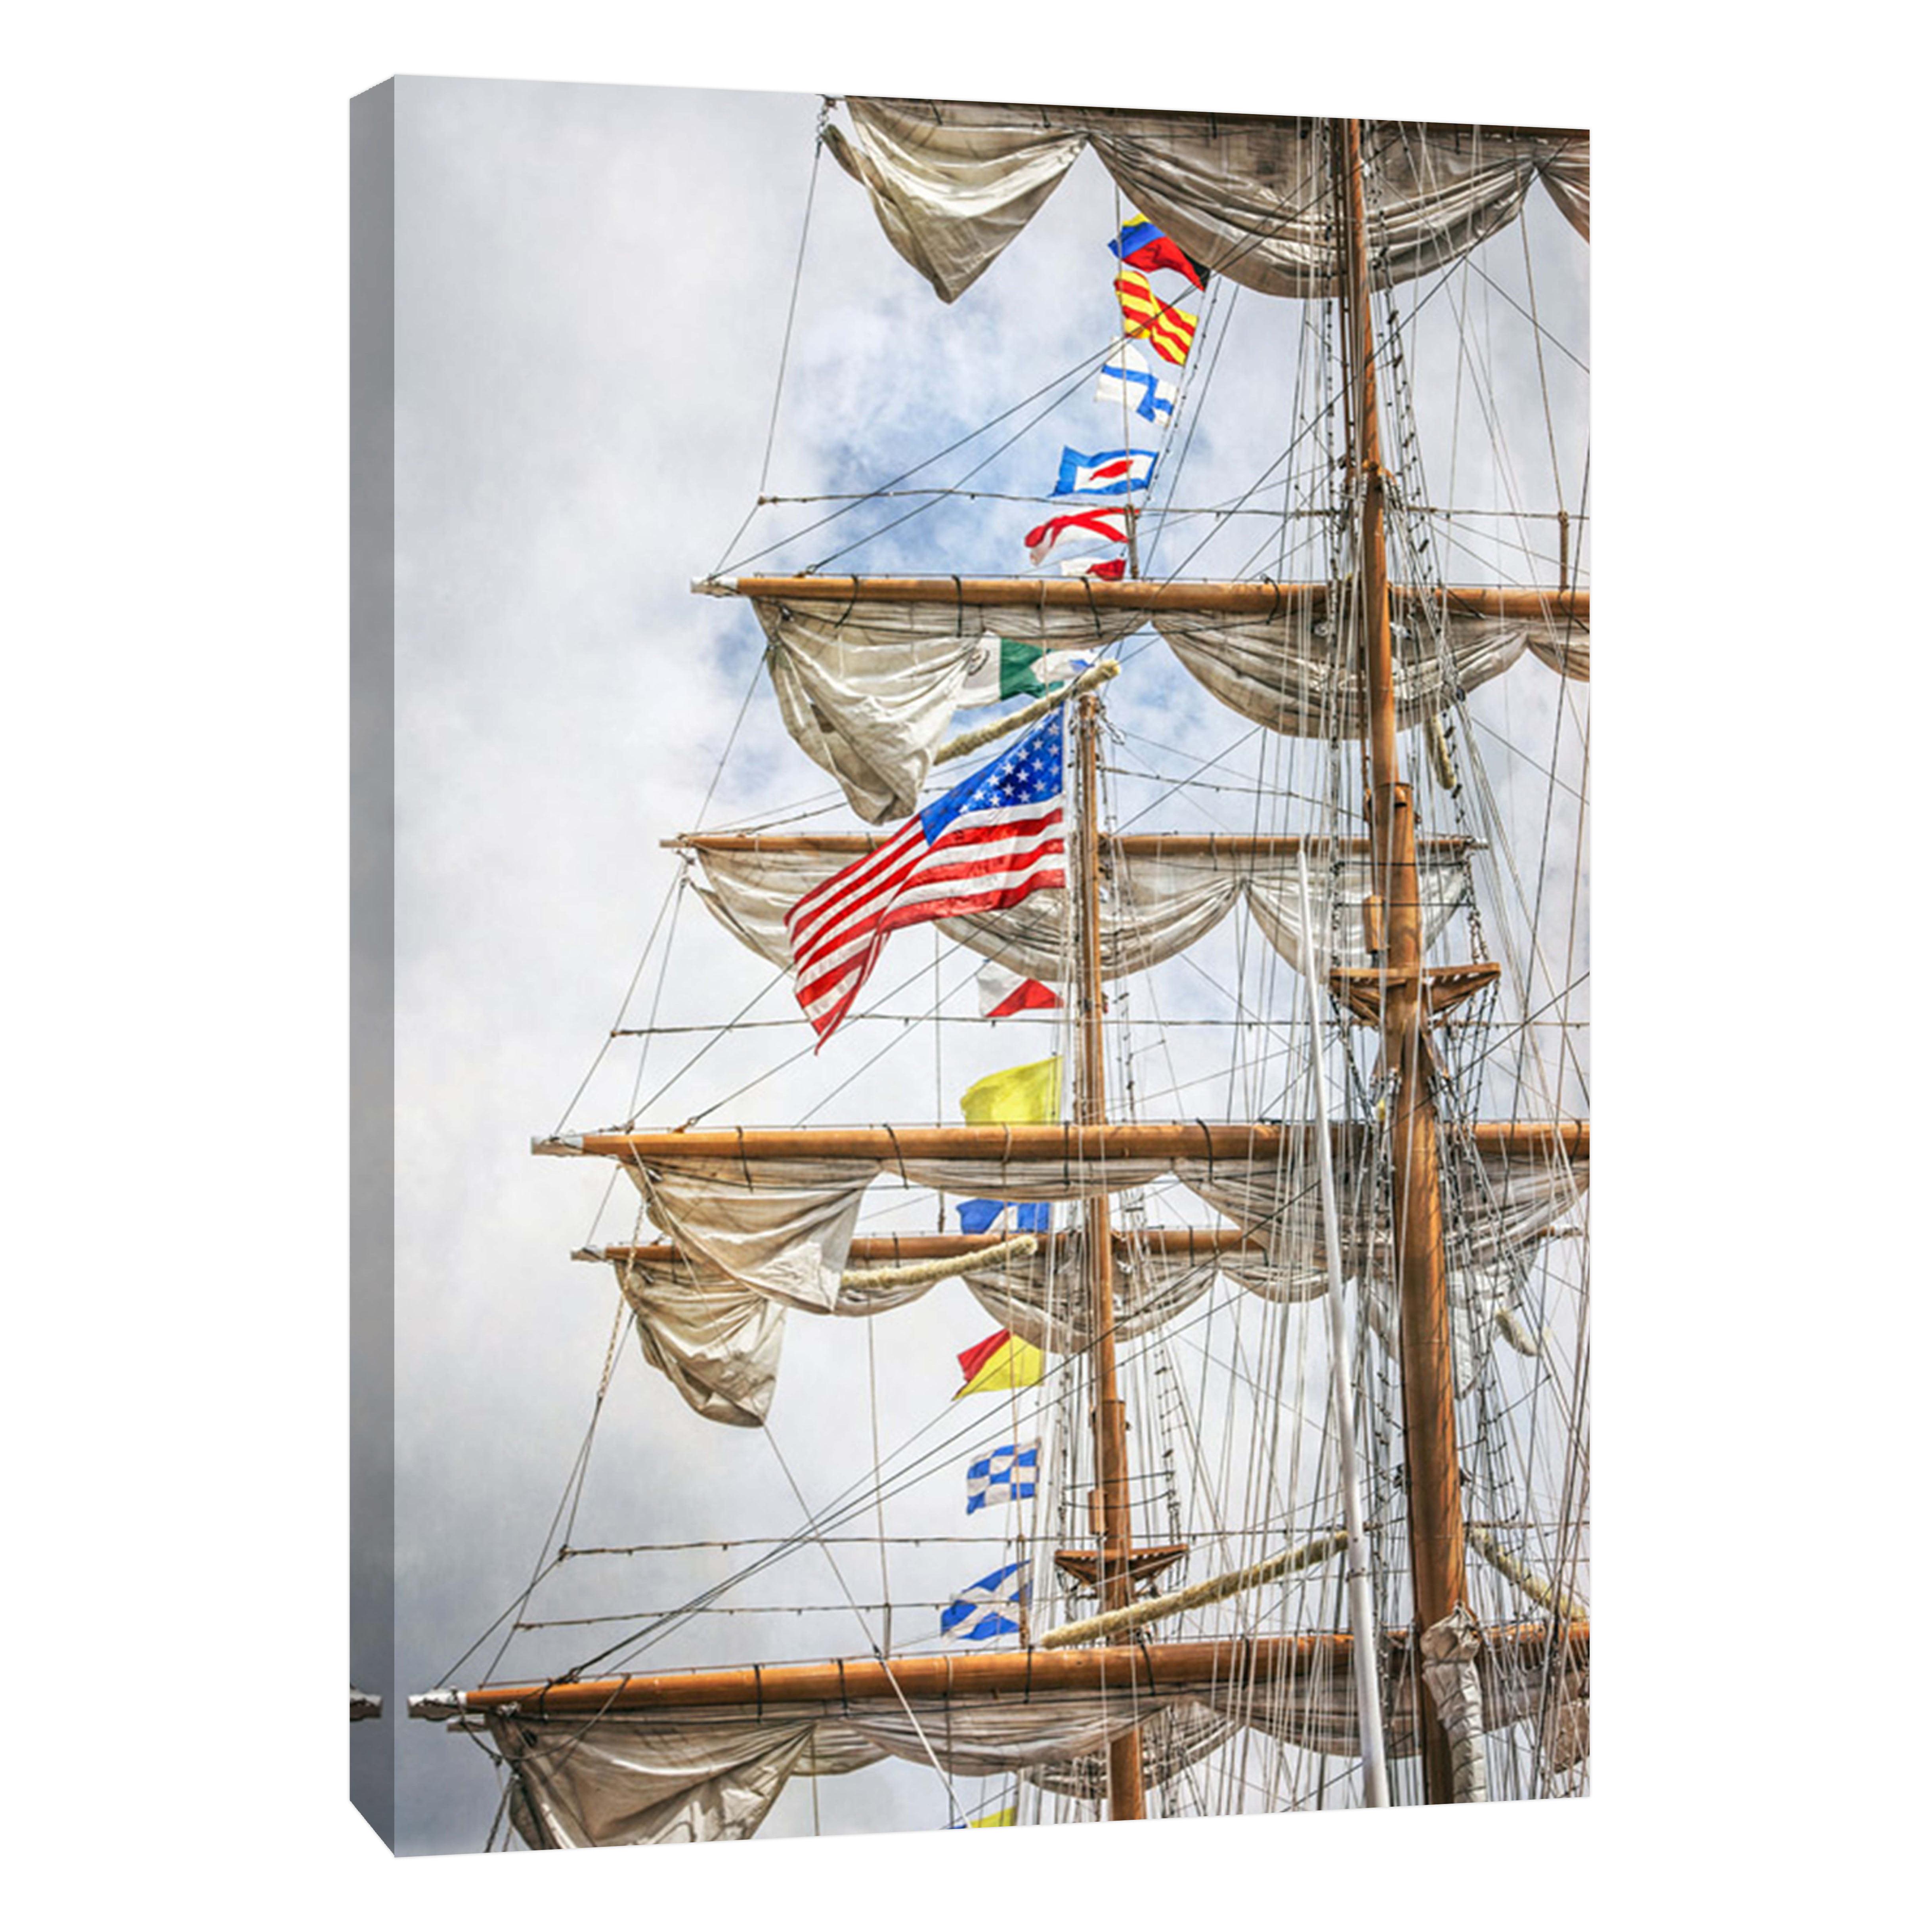 Ptm Images Tall Ship Mast Detail 16x20 Decorative Canvas Wall Art Walmart Com Walmart Com